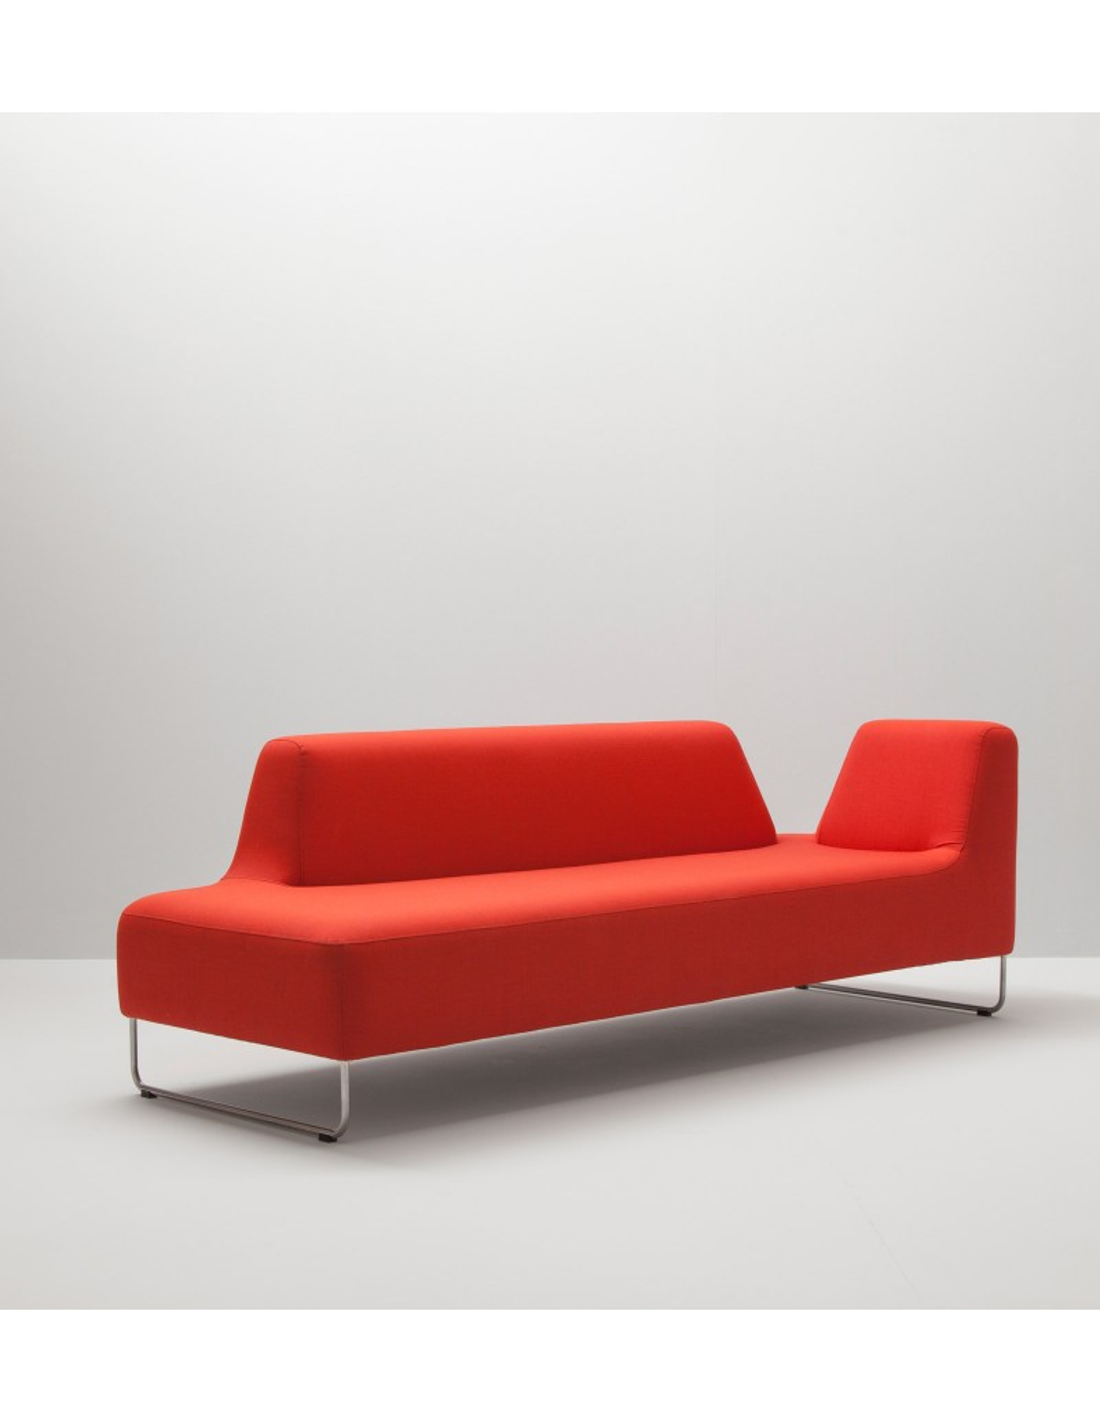 canap modulable ugo de norway says pour lk hjelle mobilier scandinave de luxe. Black Bedroom Furniture Sets. Home Design Ideas